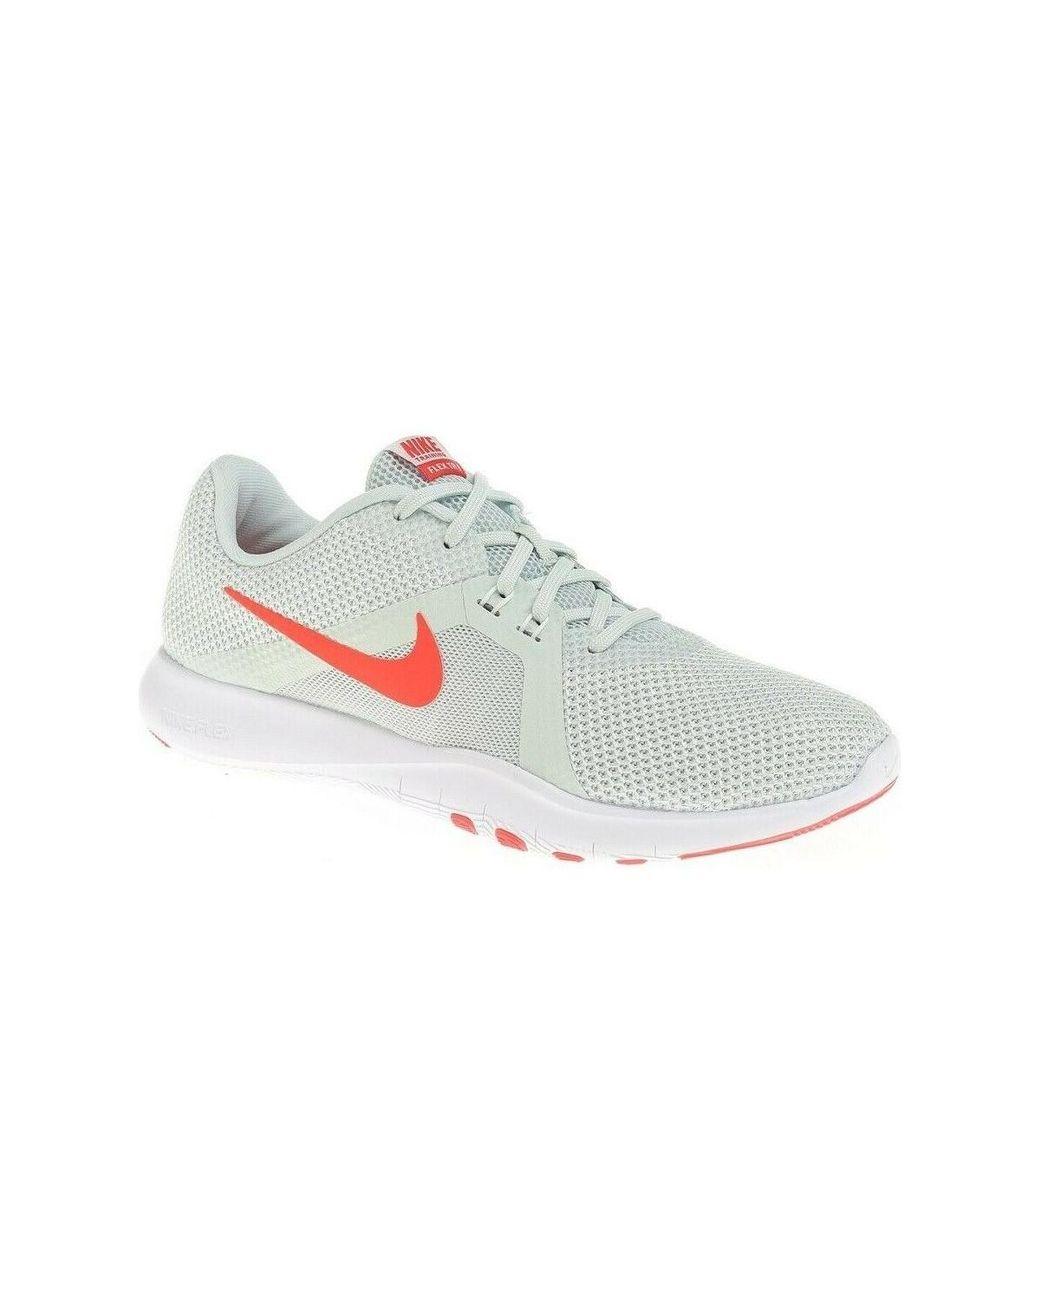 c5ceea4a3e58 Nike Flex Tr 8 924339 Women s Shoes (trainers) In Grey in Gray - Lyst